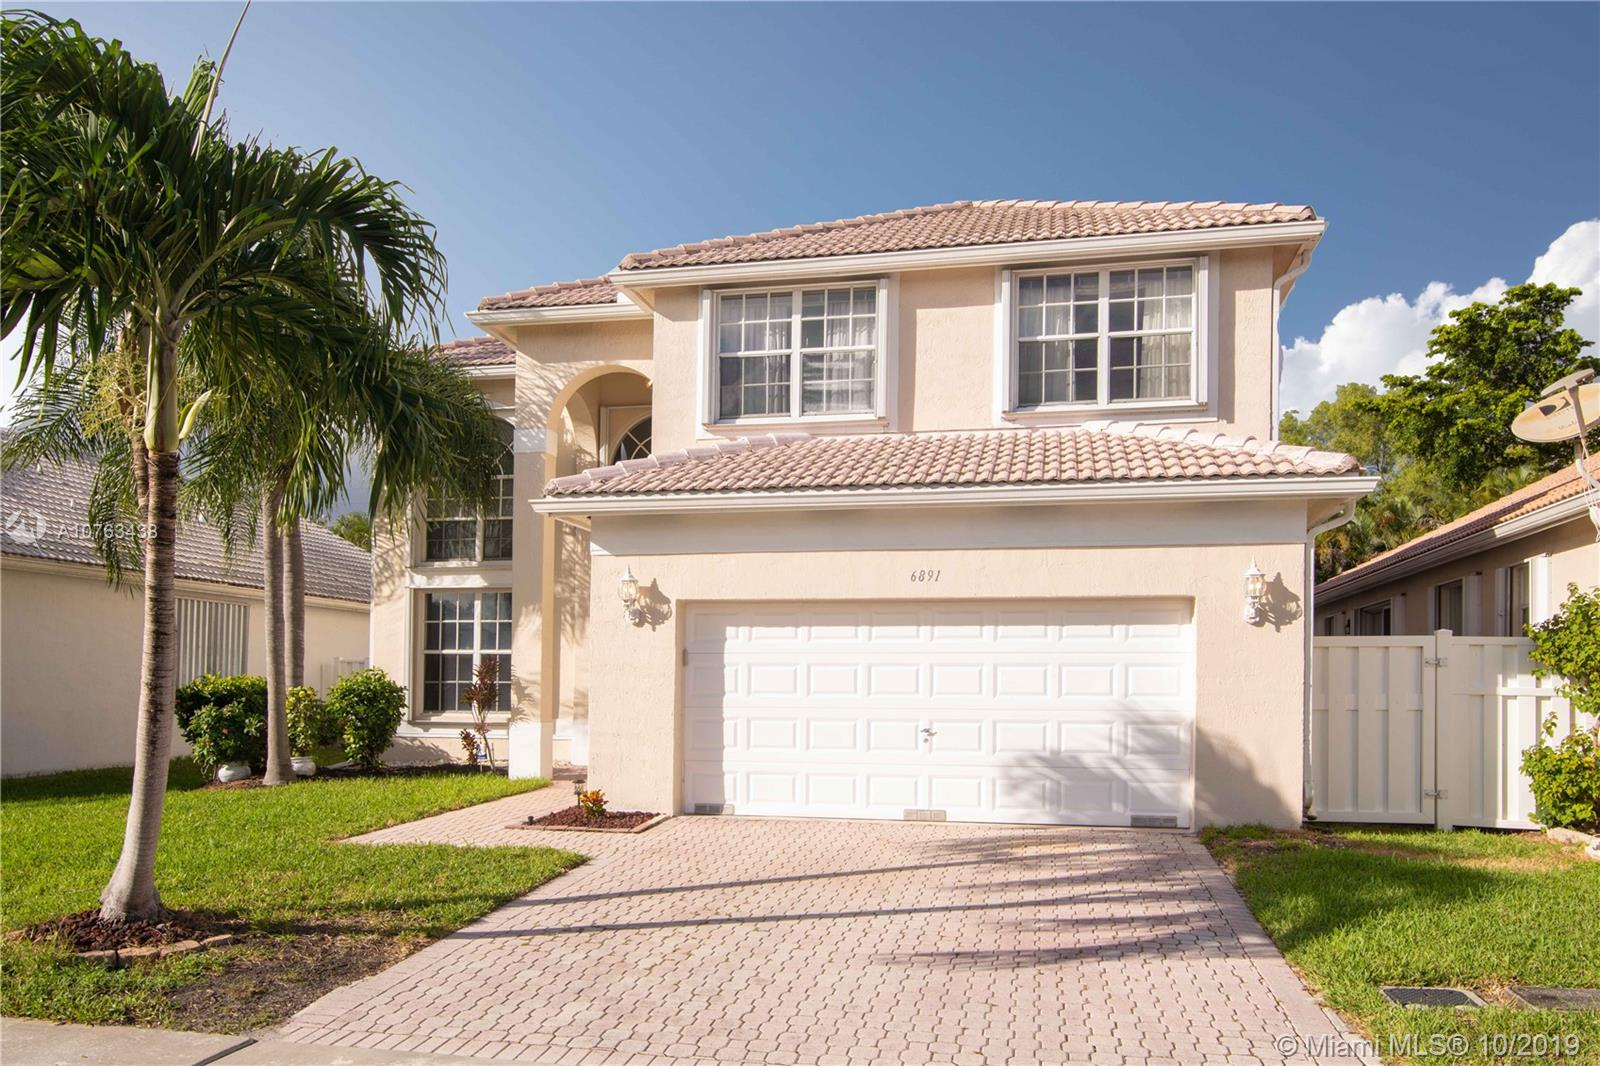 Margate Fl Homes For Sale Palm Beach Broward Homes